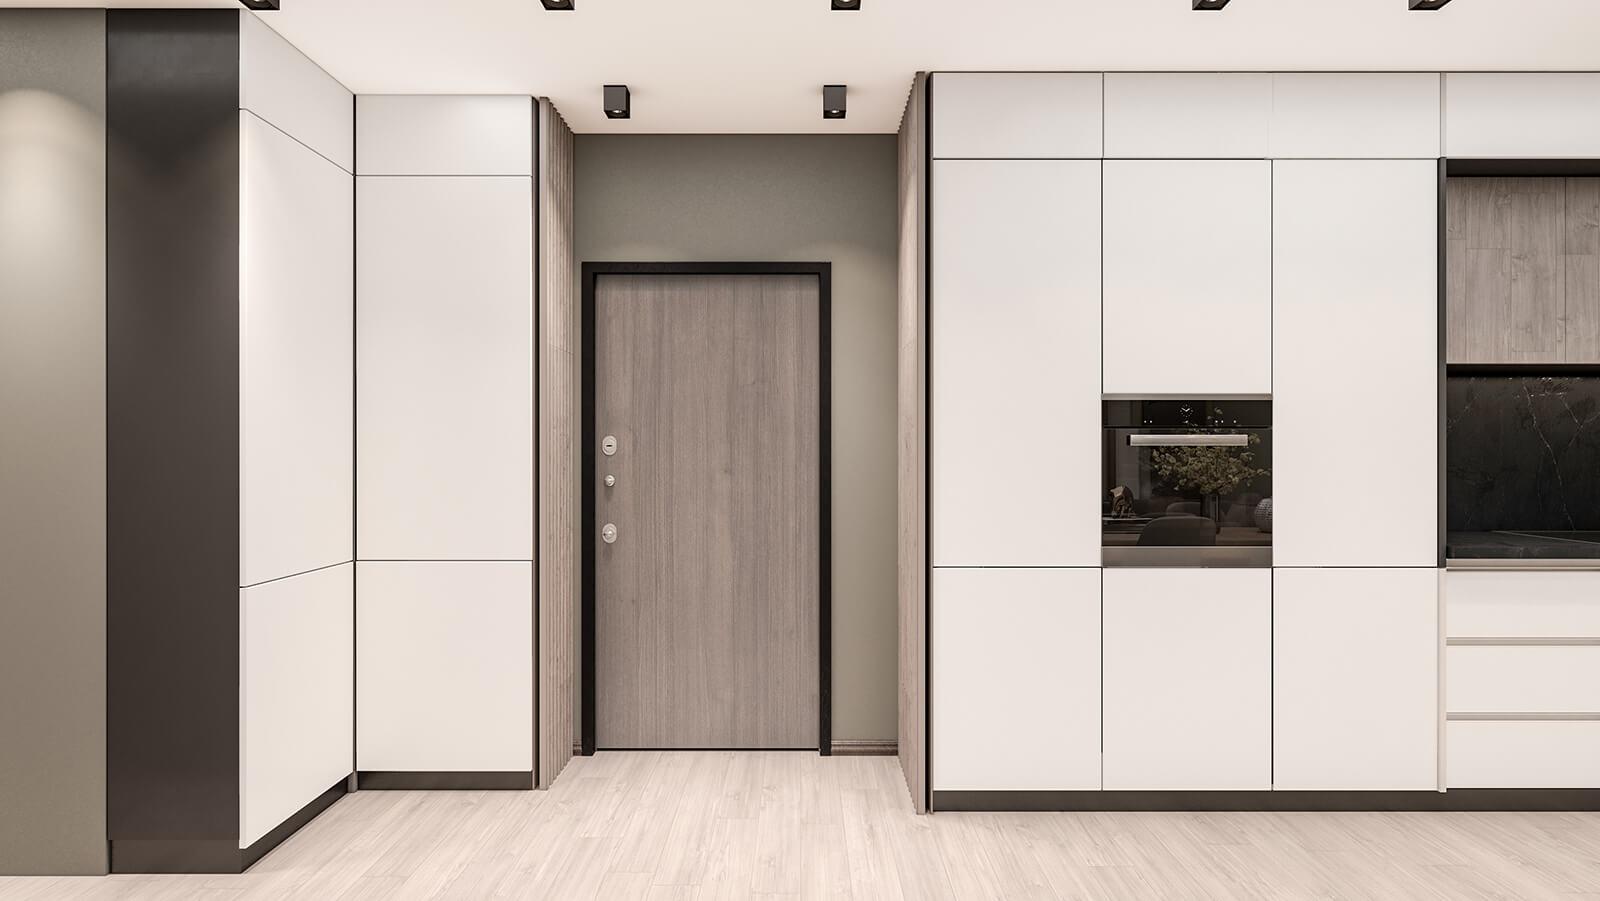 interioren-dizain-proekt-na-koridor-prato (1)